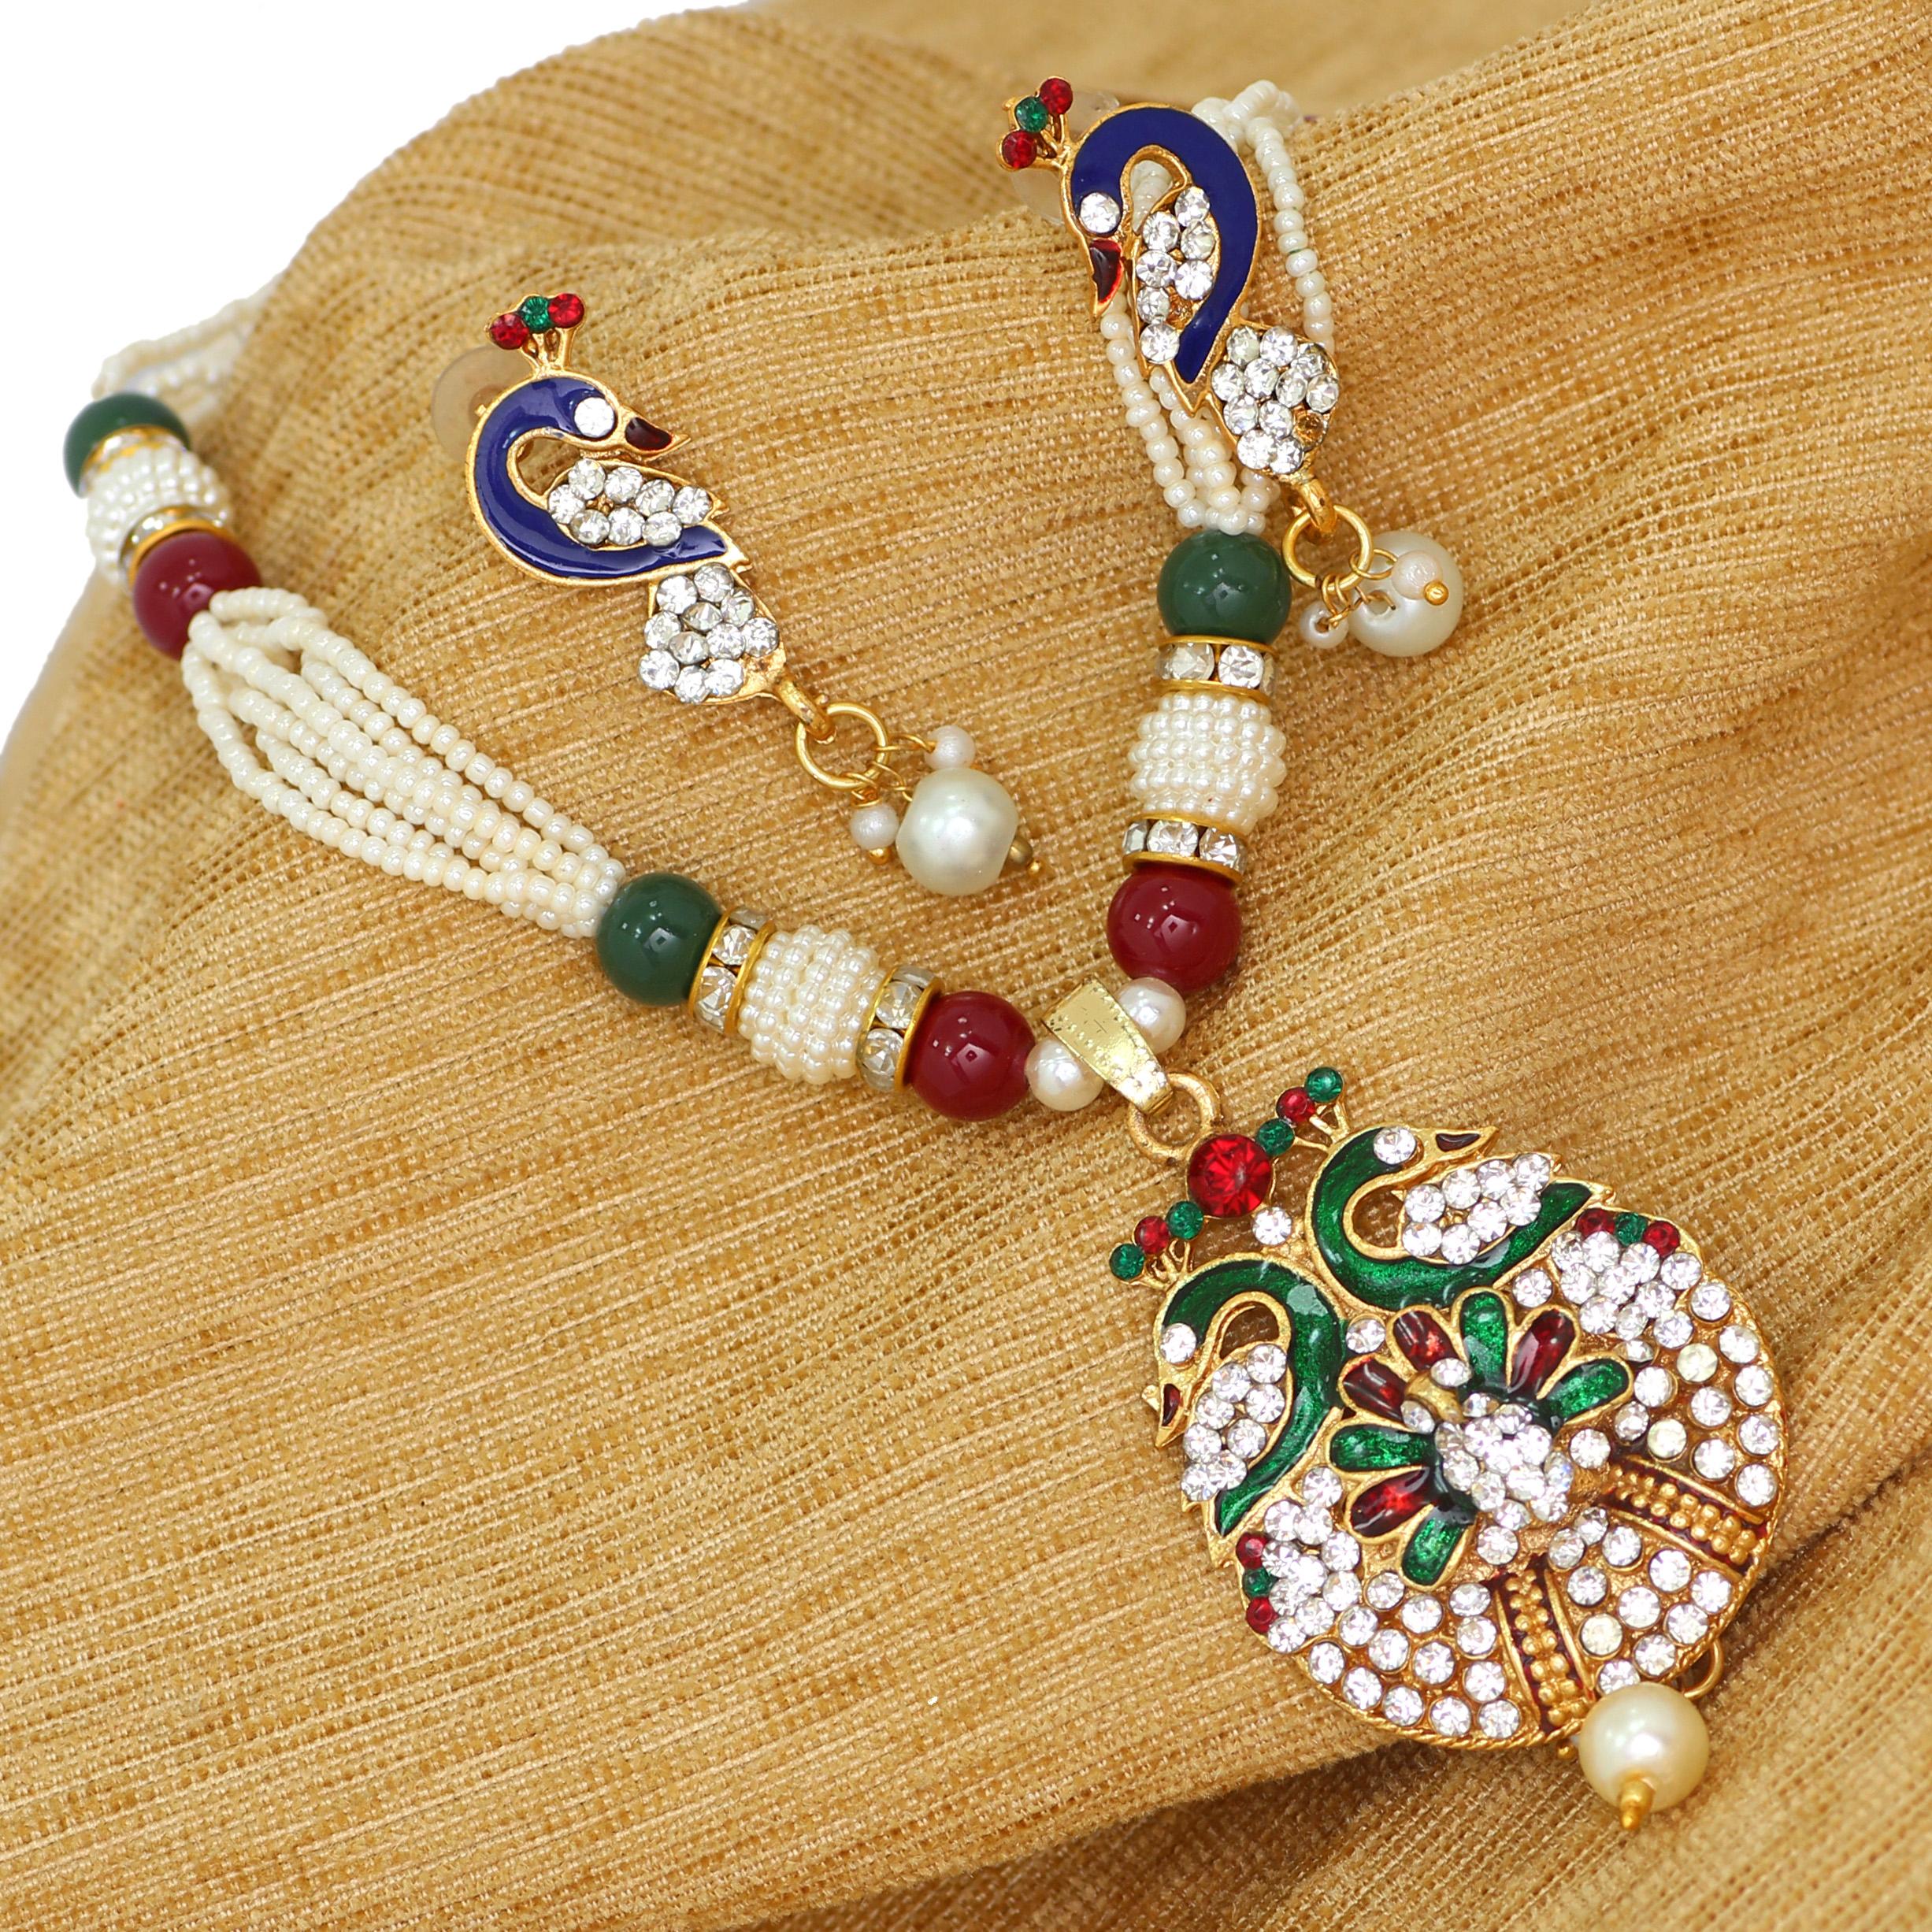 d627ea9cfa66f Handmade seeds beads string with meenakri work pendant set women necklace  set